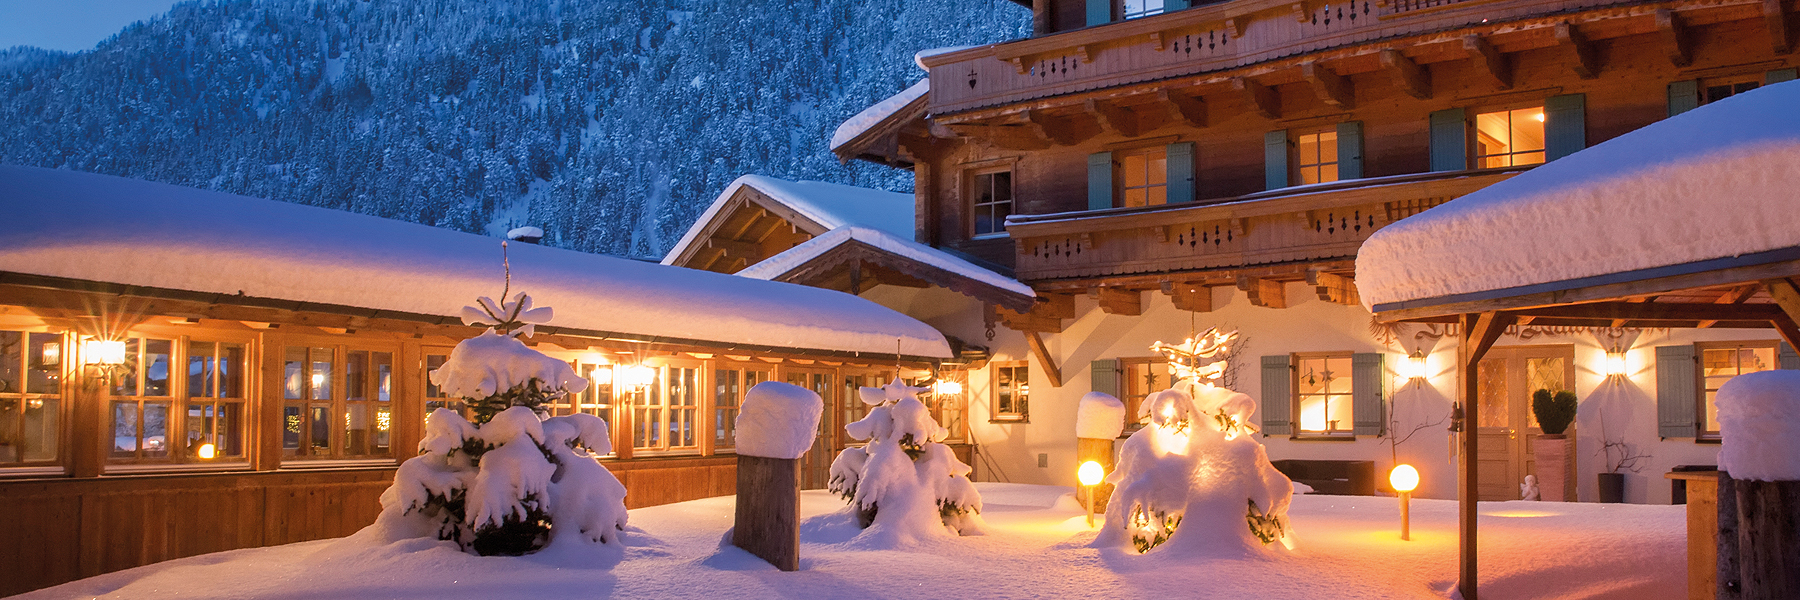 Winter Hotel Waidringer Hof